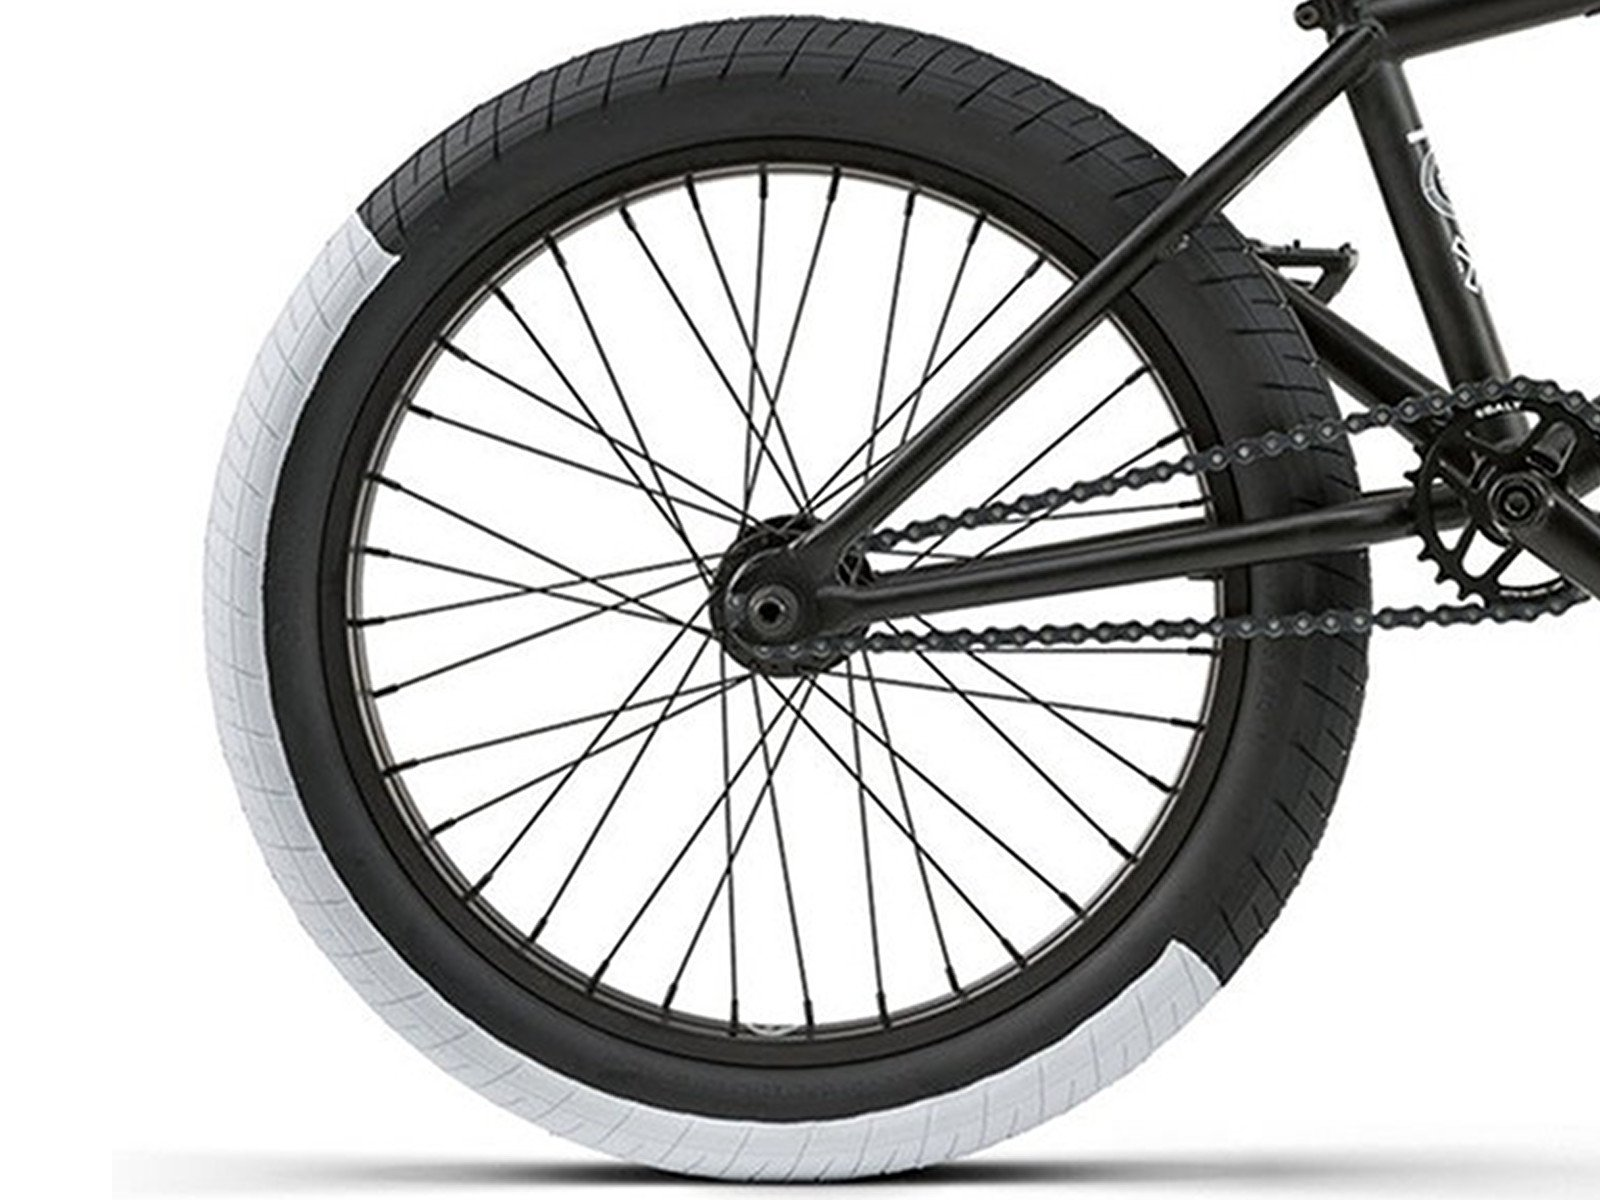 120psi {2x} 650x23c Blue Bicycle Tires 23-571